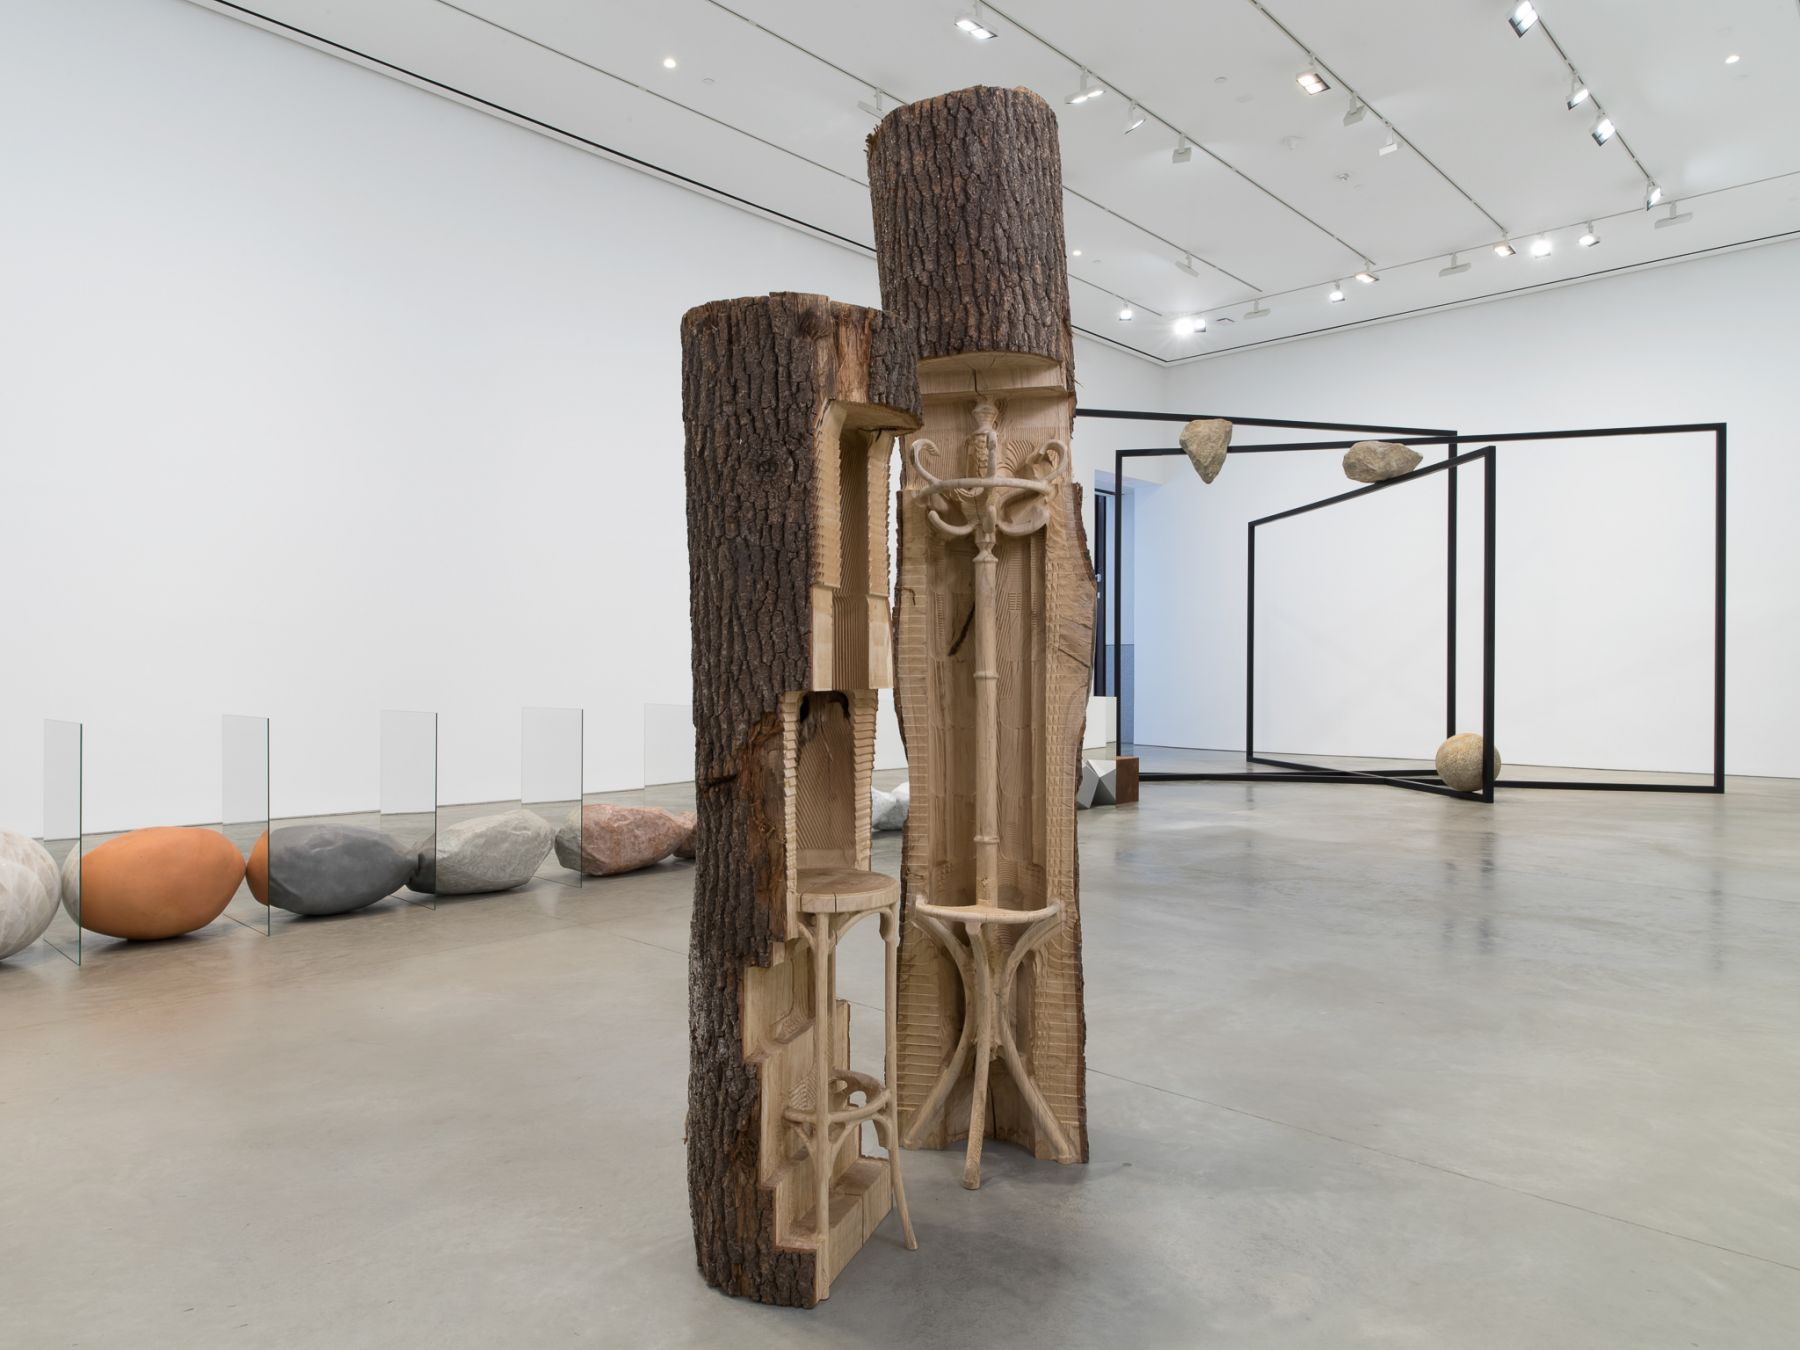 Installation view: Alicja Kwade,ParaParticular, 303 Gallery, New York, 2019